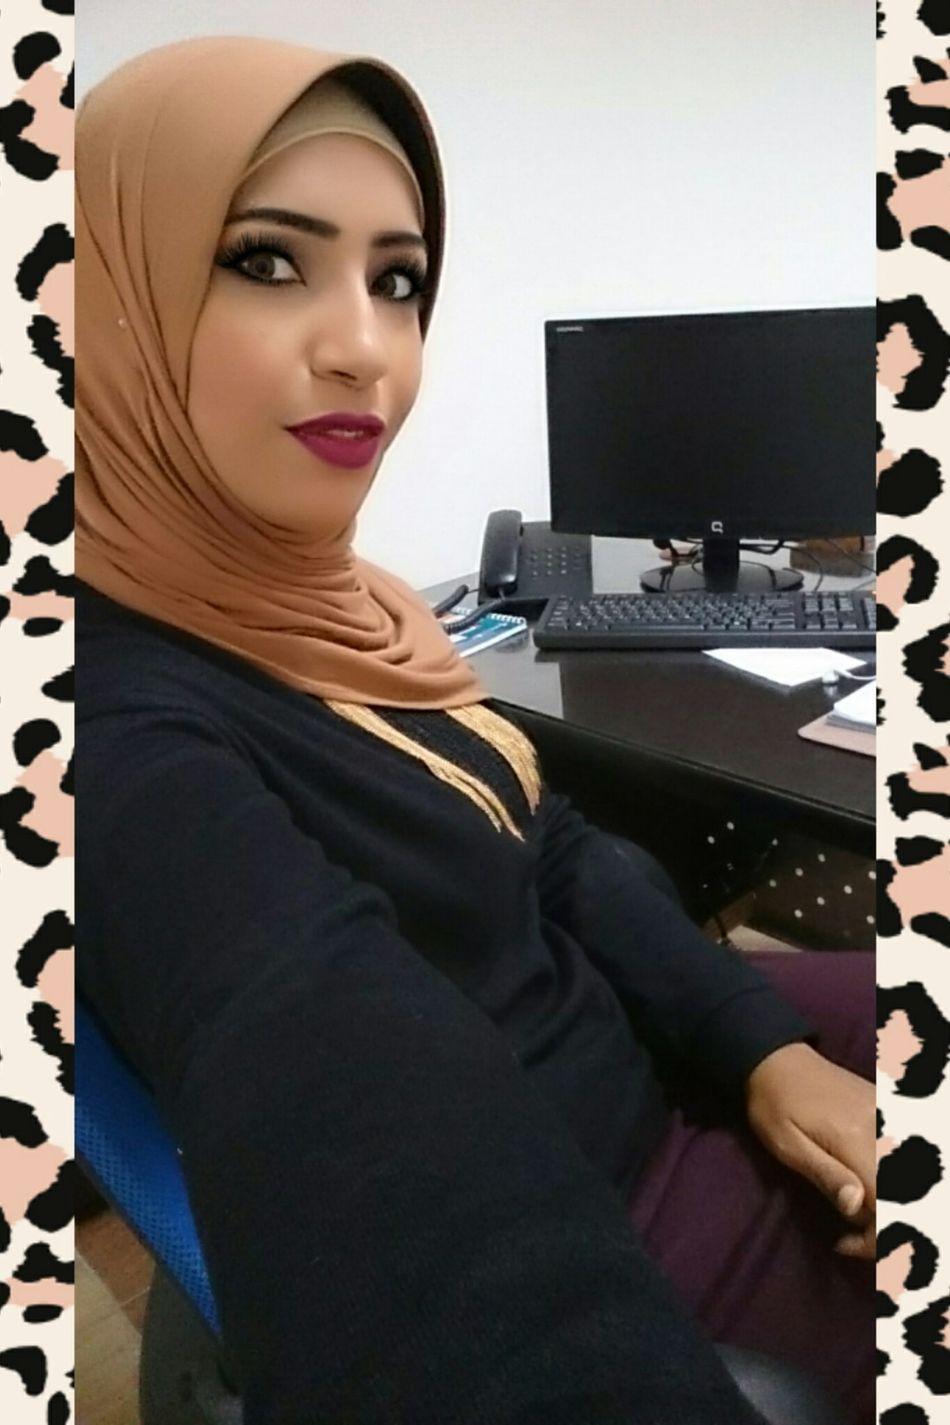 Portrait Relaxation Happiness Cheerful Beauty People Smiling Beautiful People Hijab Hijabfashion Simply Me ❤ Hijabstyle  Hijabbeauty Hijabgirl Hijabselfie Hijaber Hijabista Hijaboftheday Hijab Session Hijabdaily Beautiful Woman Women Lips Eyes Picoftheday